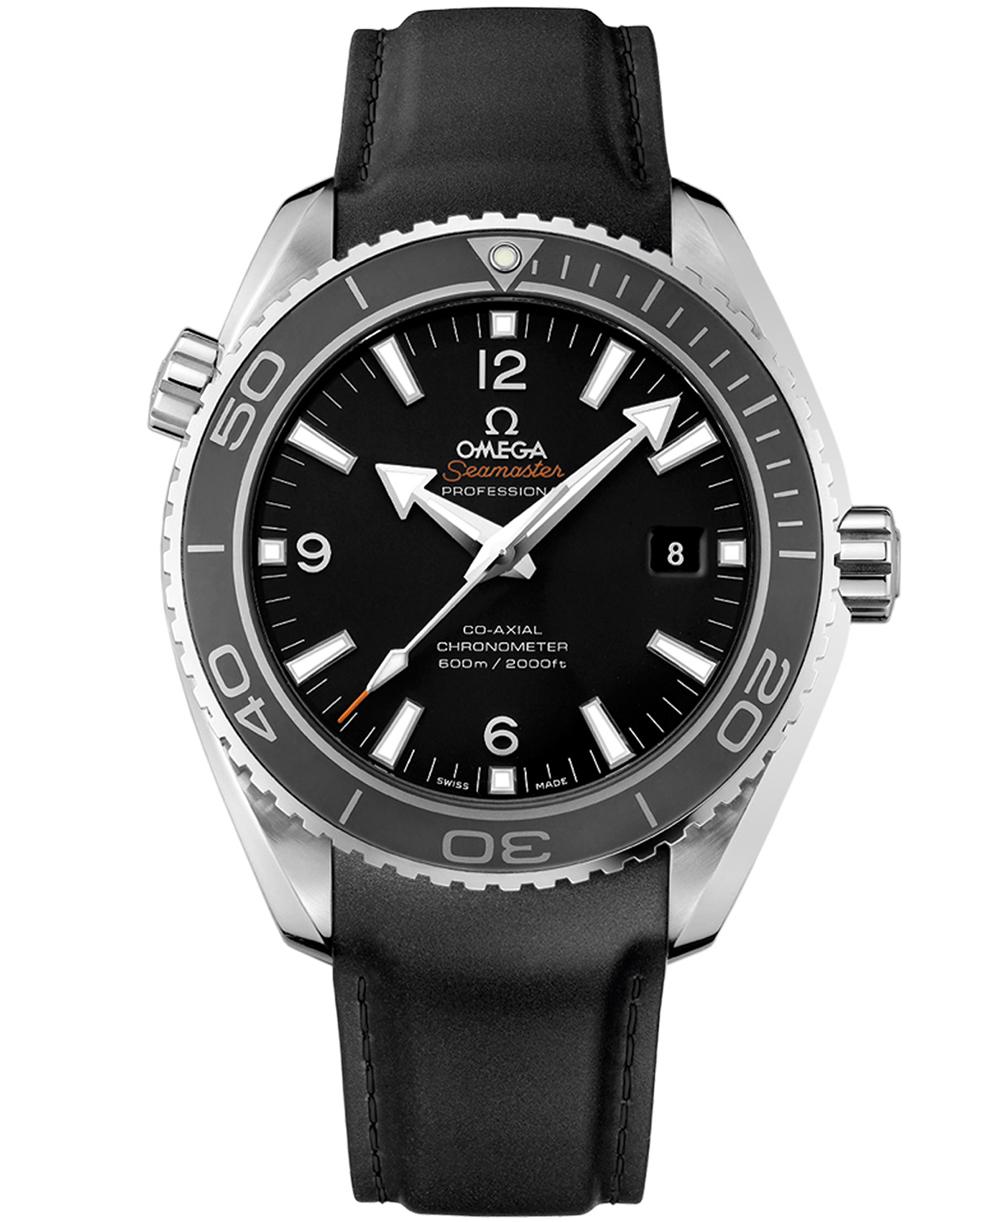 Sailing watches: Omega